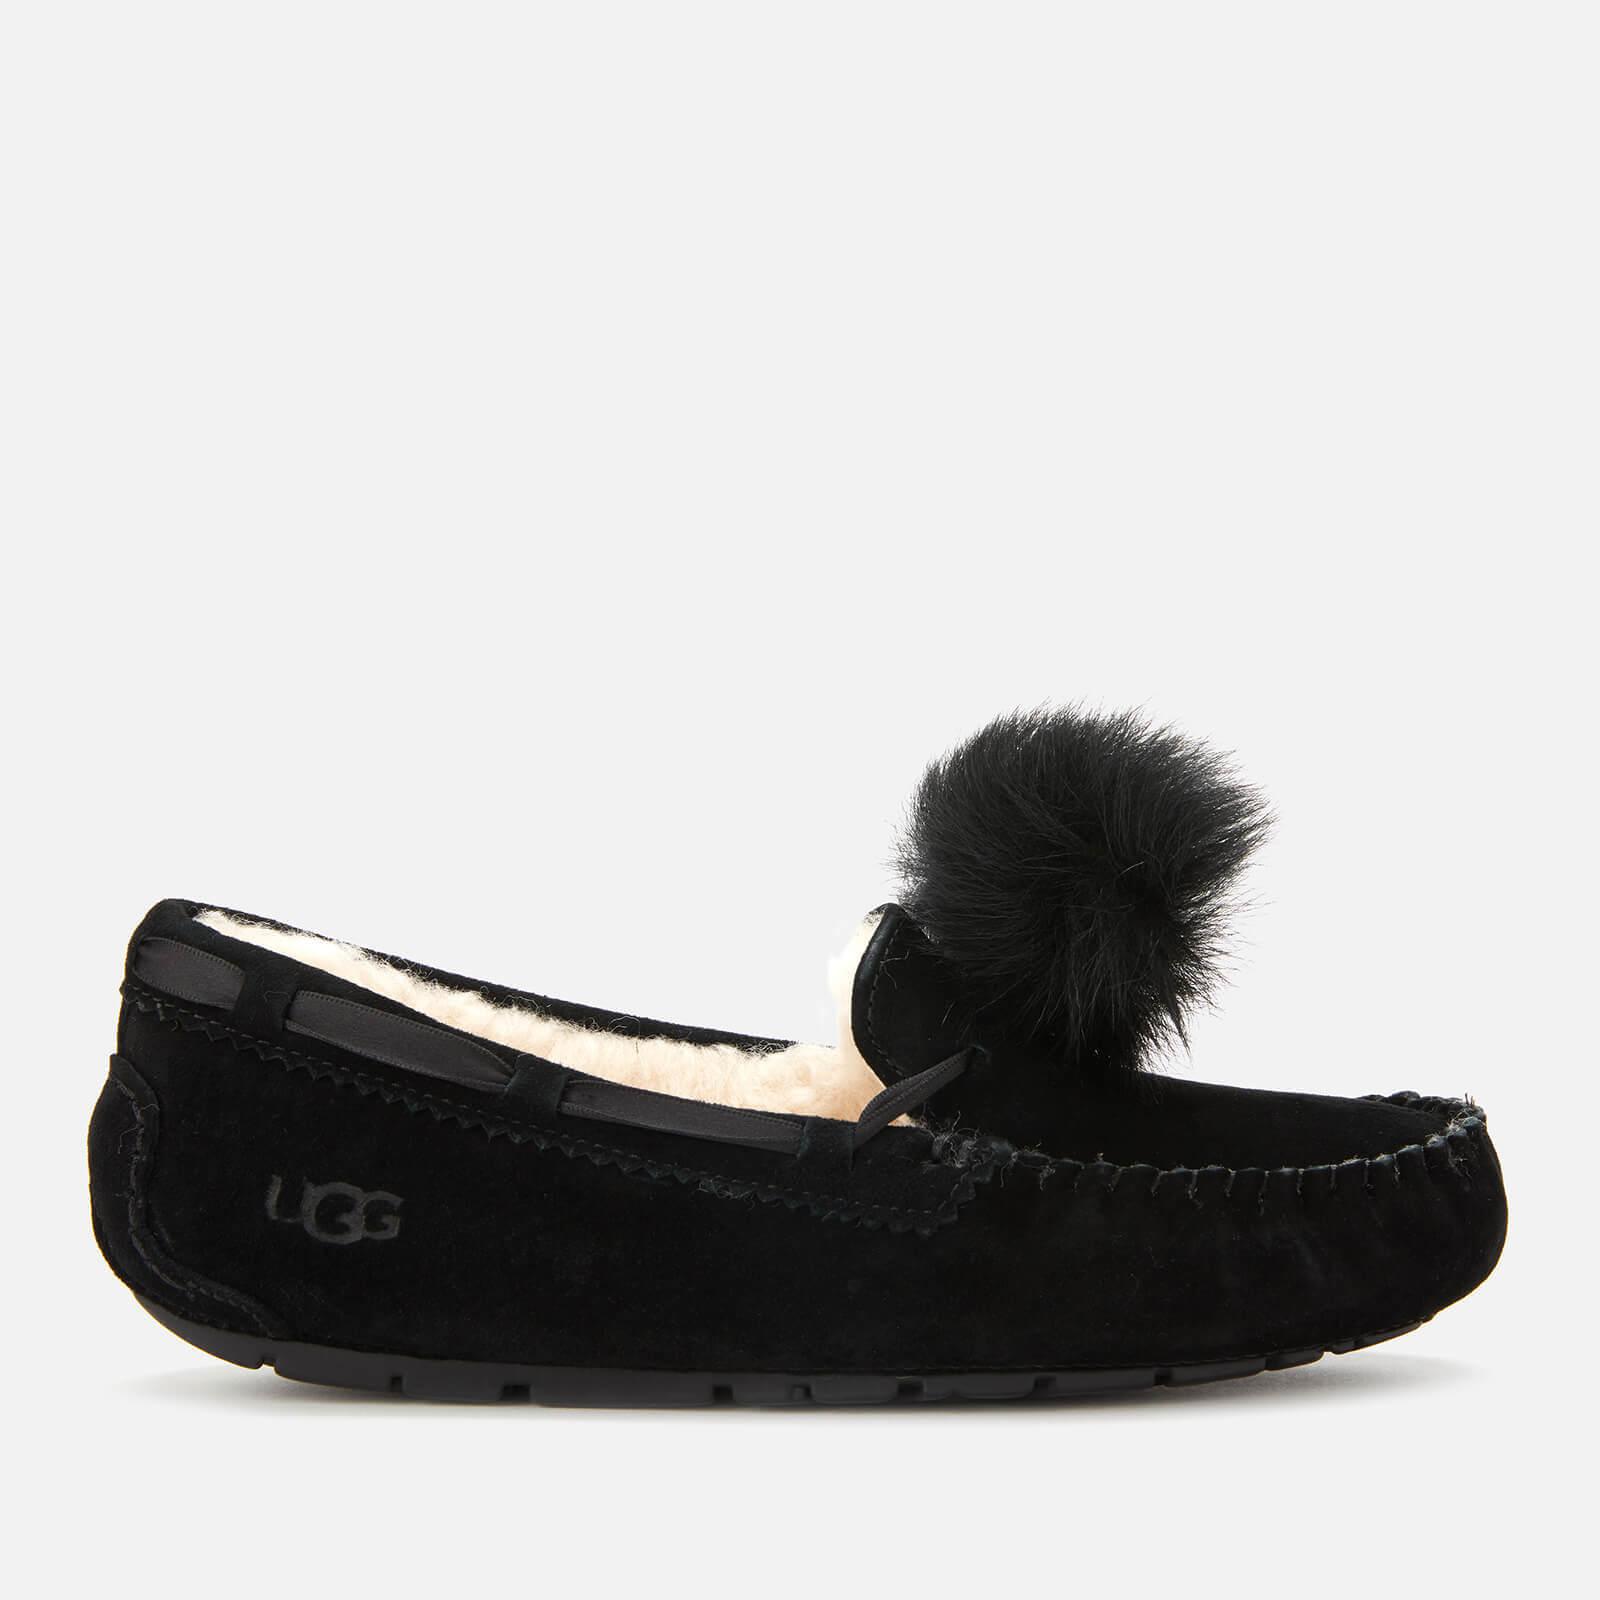 UGG Women's Dakota Pom Pom Moccasin Slippers - Black - UK 7